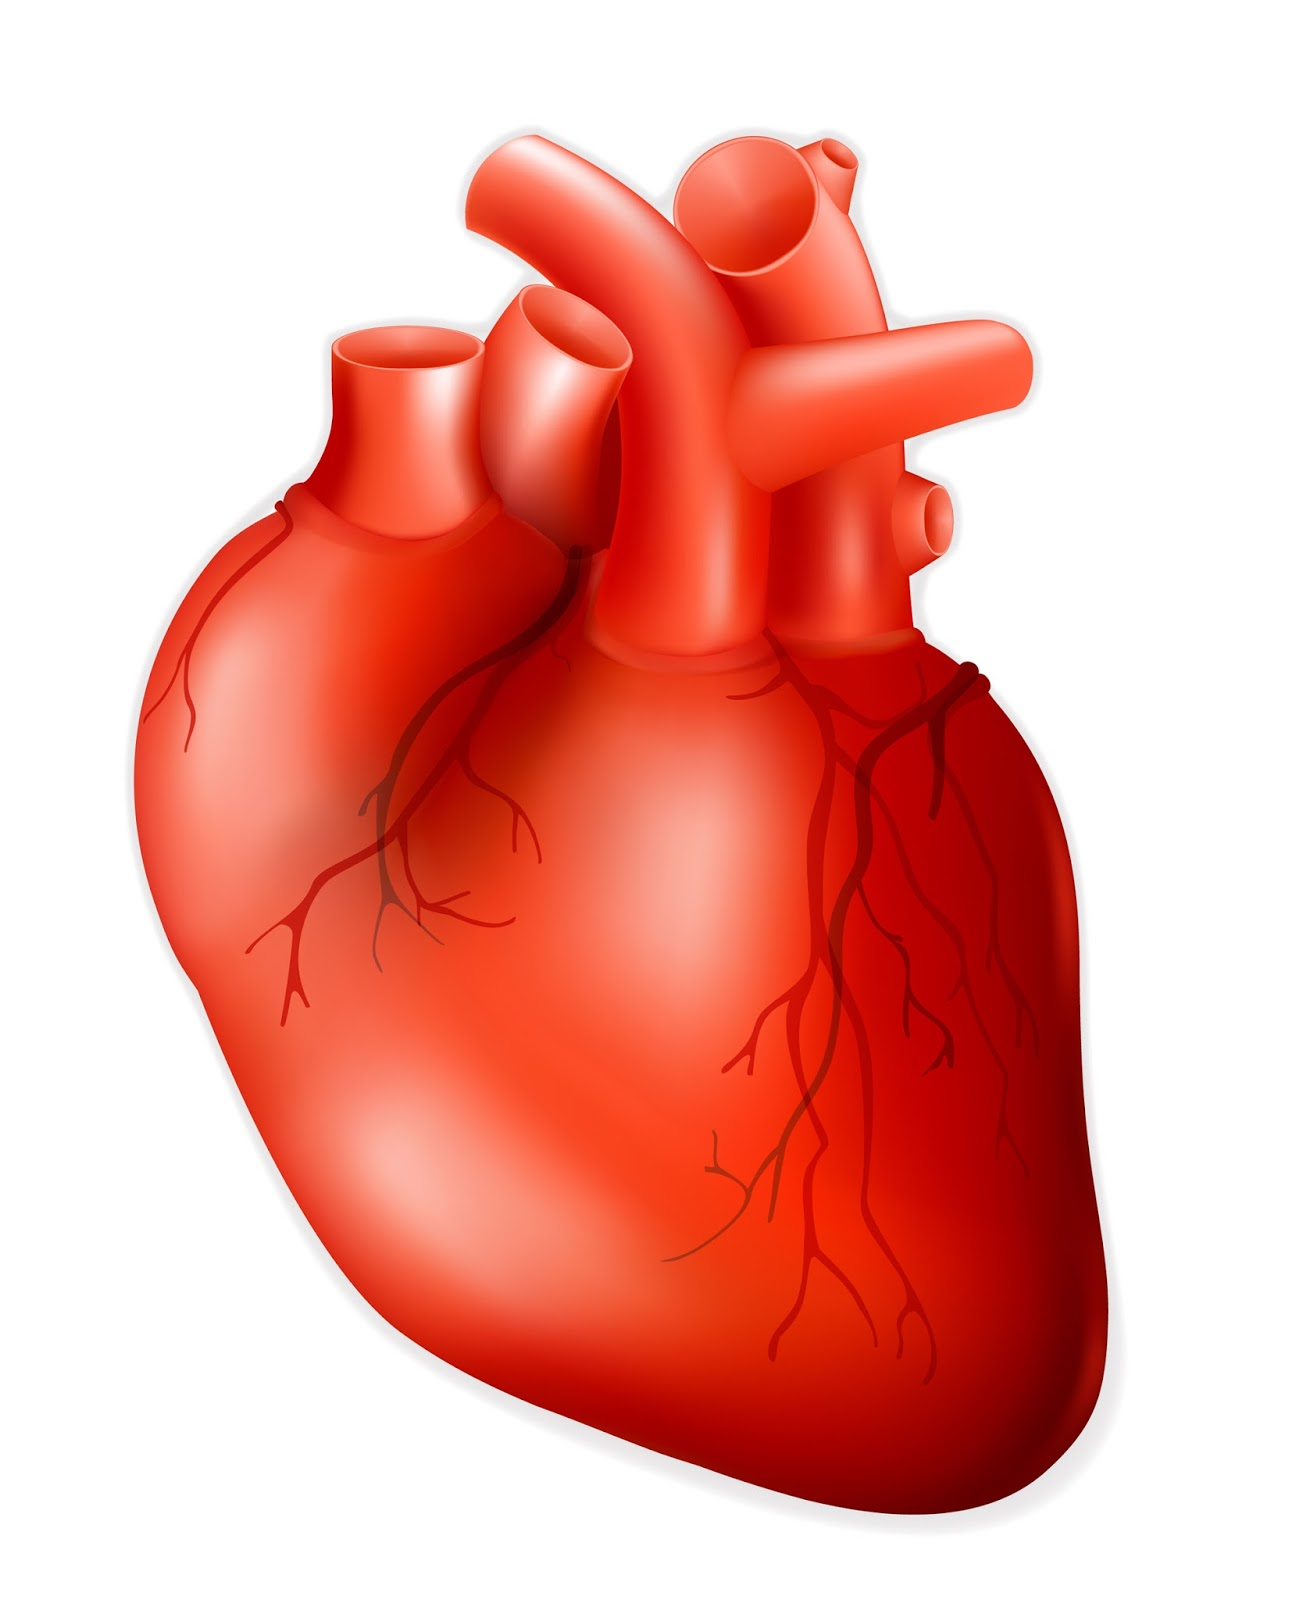 Heart Drawing Real